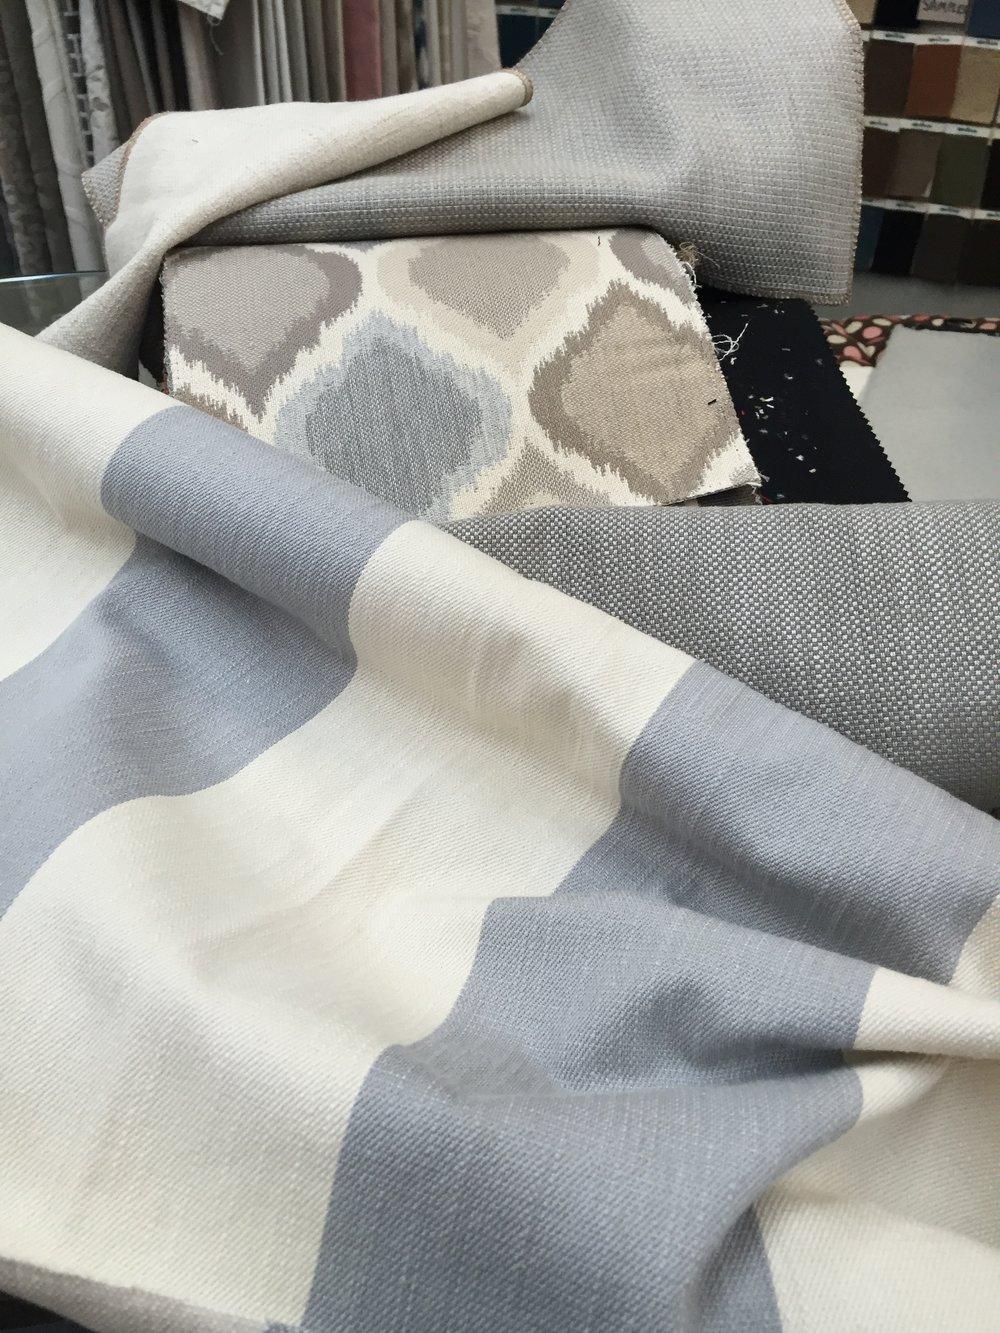 longboat fabric.JPG